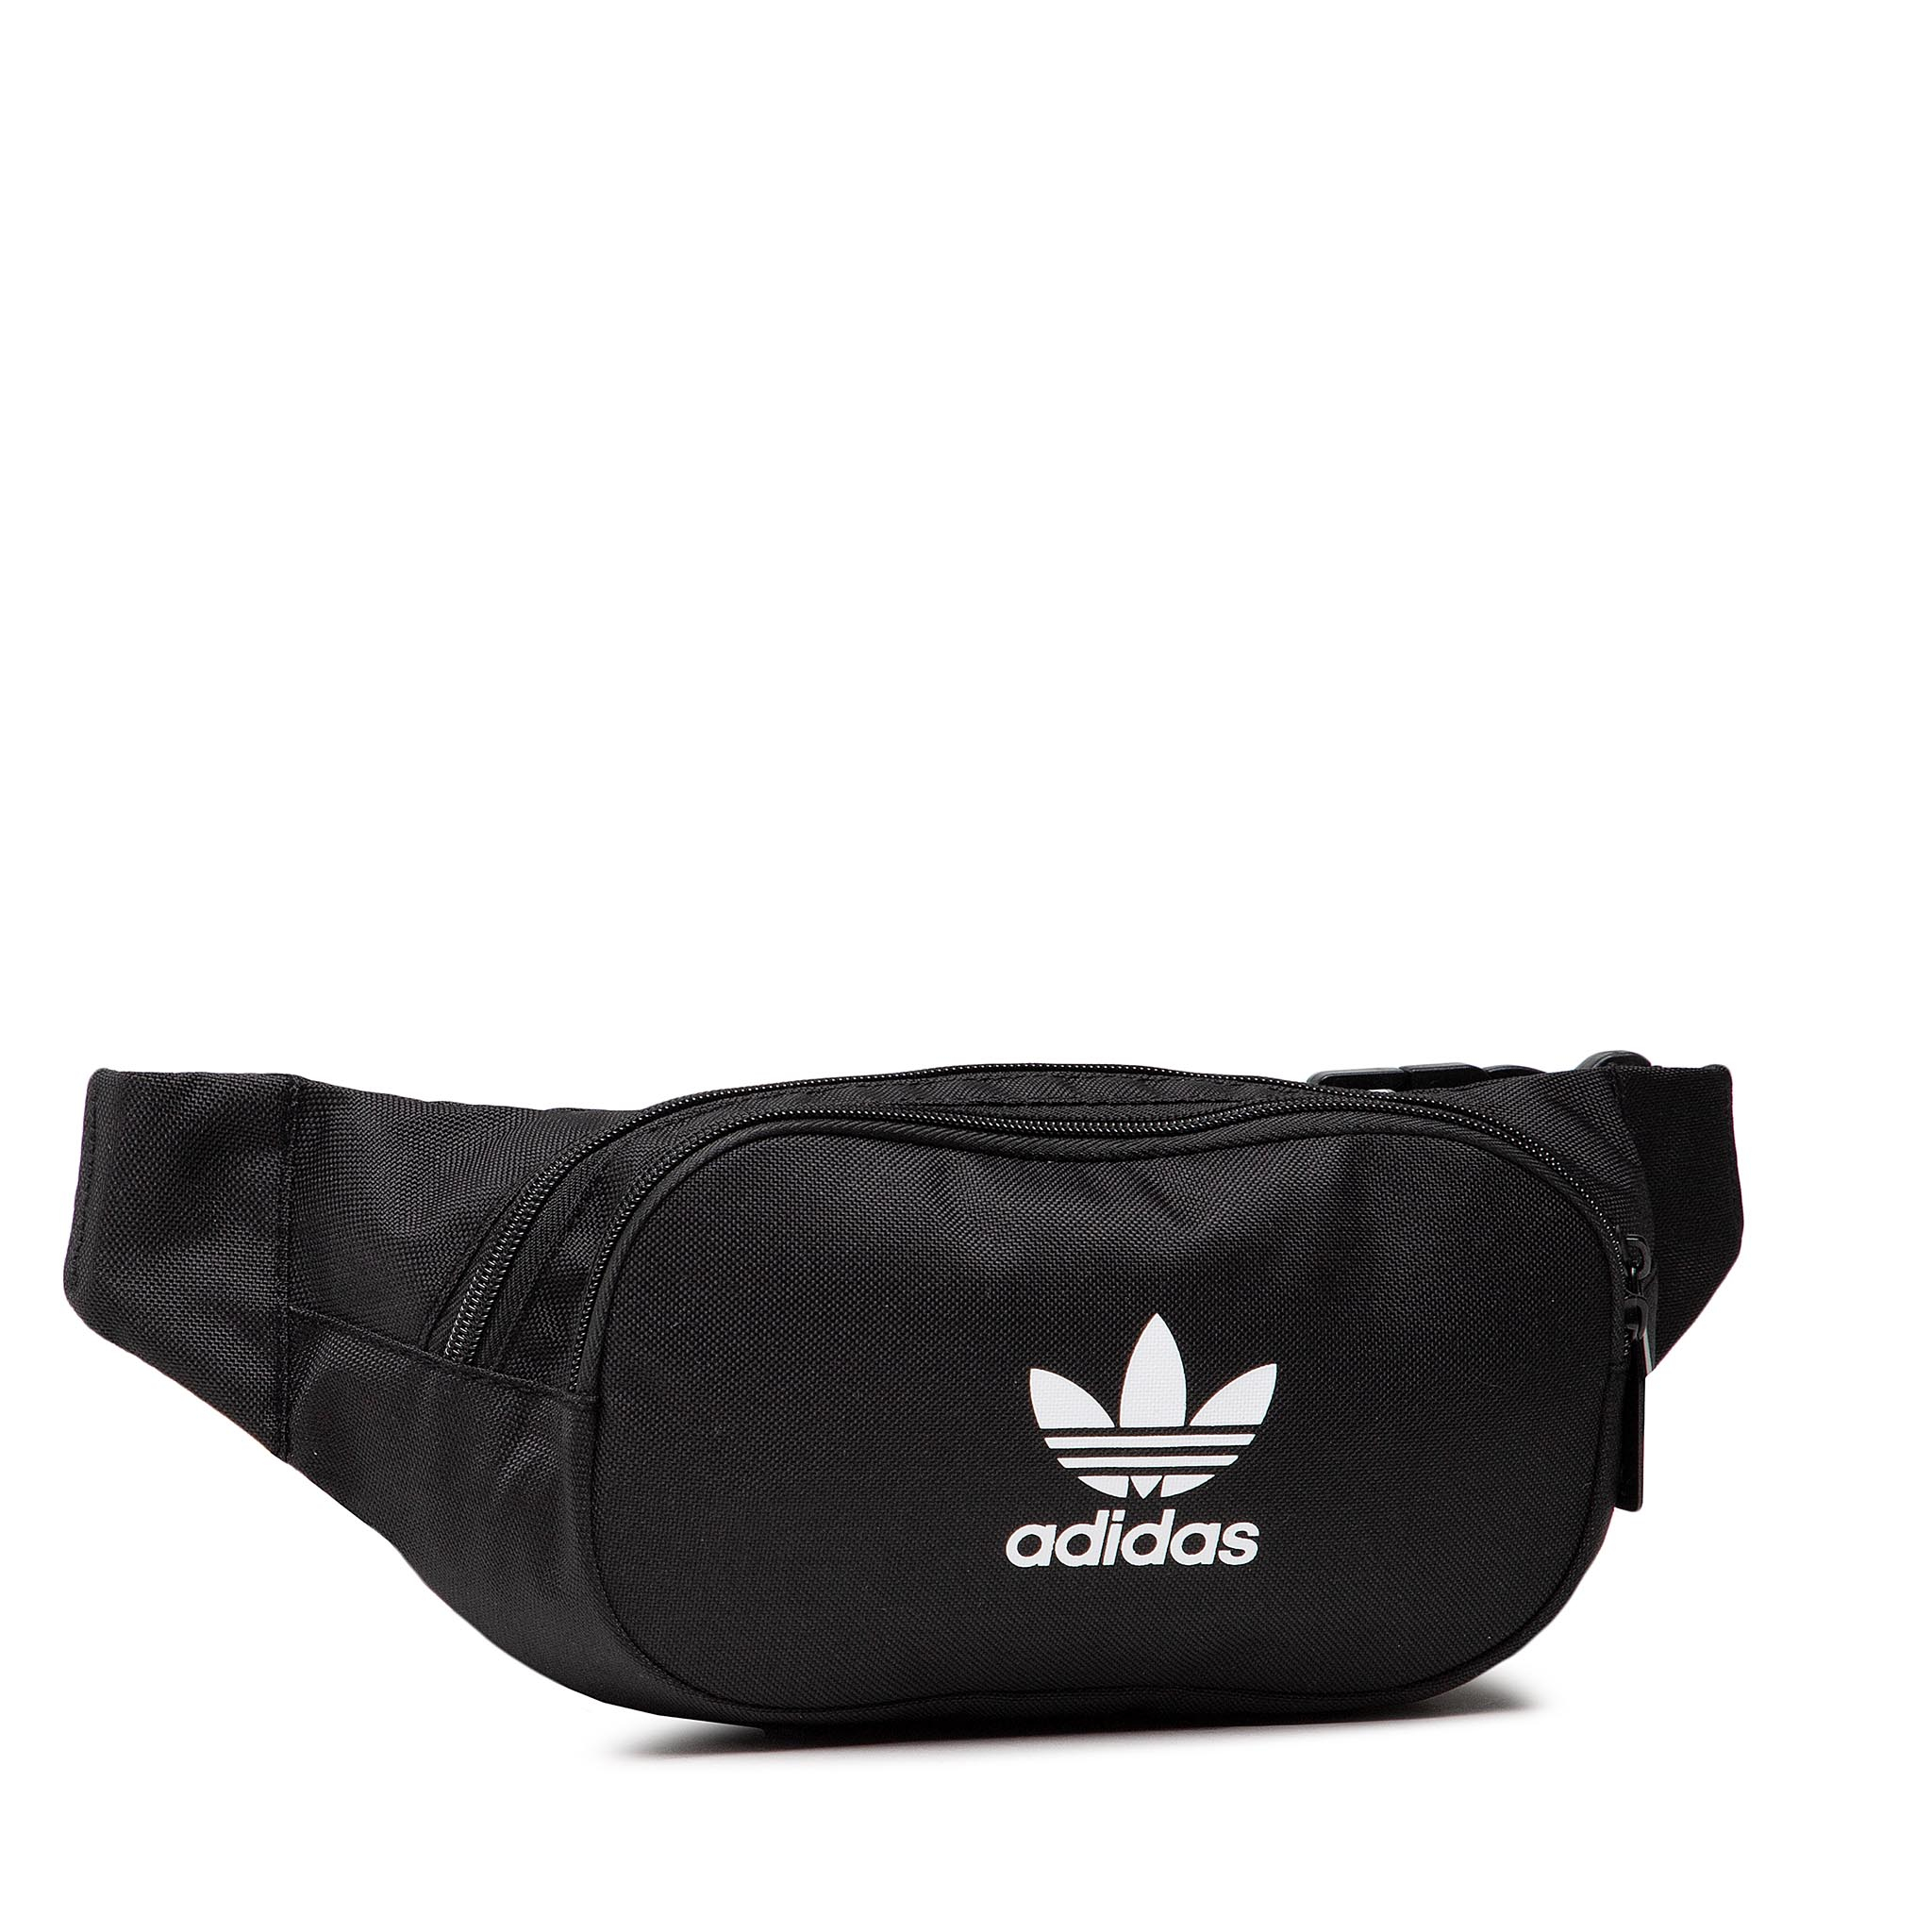 Image of Gürteltasche adidas - adicolor Waistb H35587 Black/White